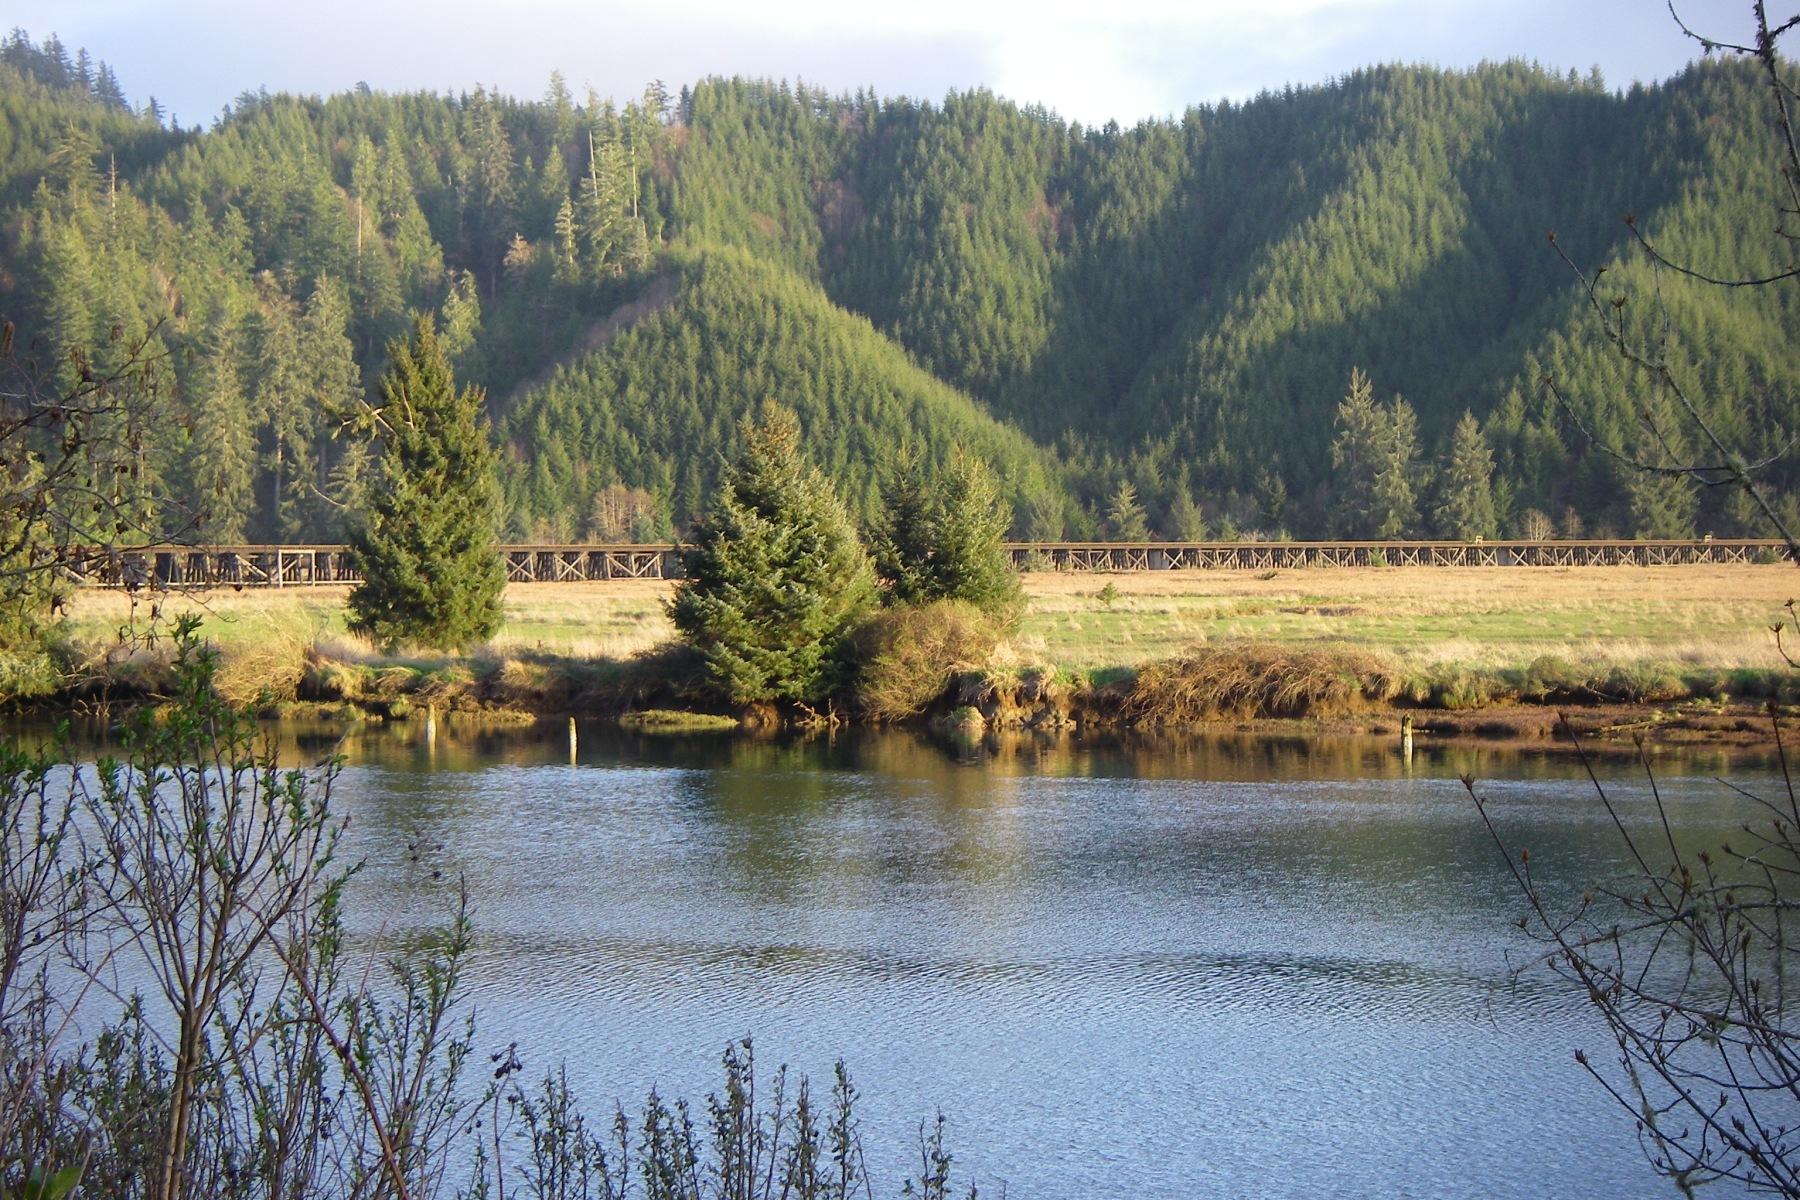 Siuslaw River